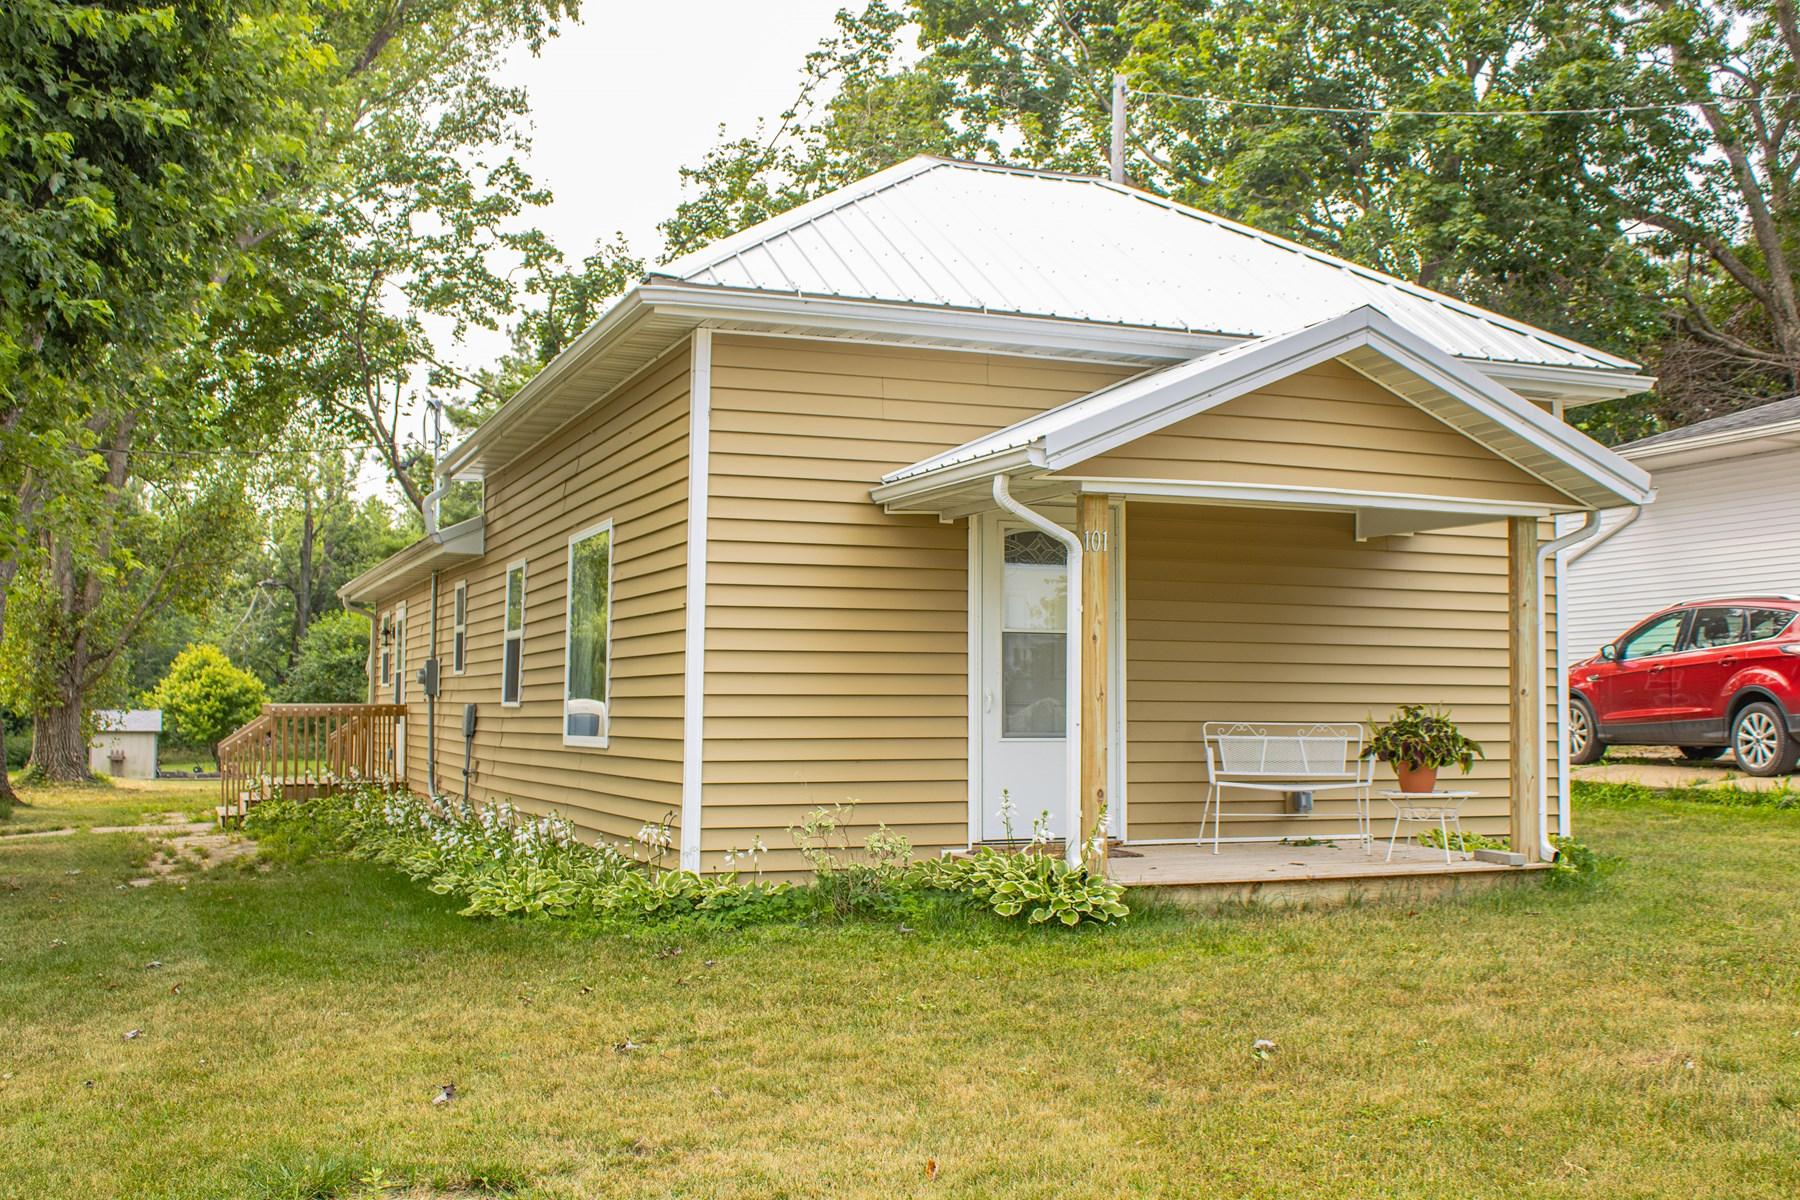 Springville Iowa Home for Sale